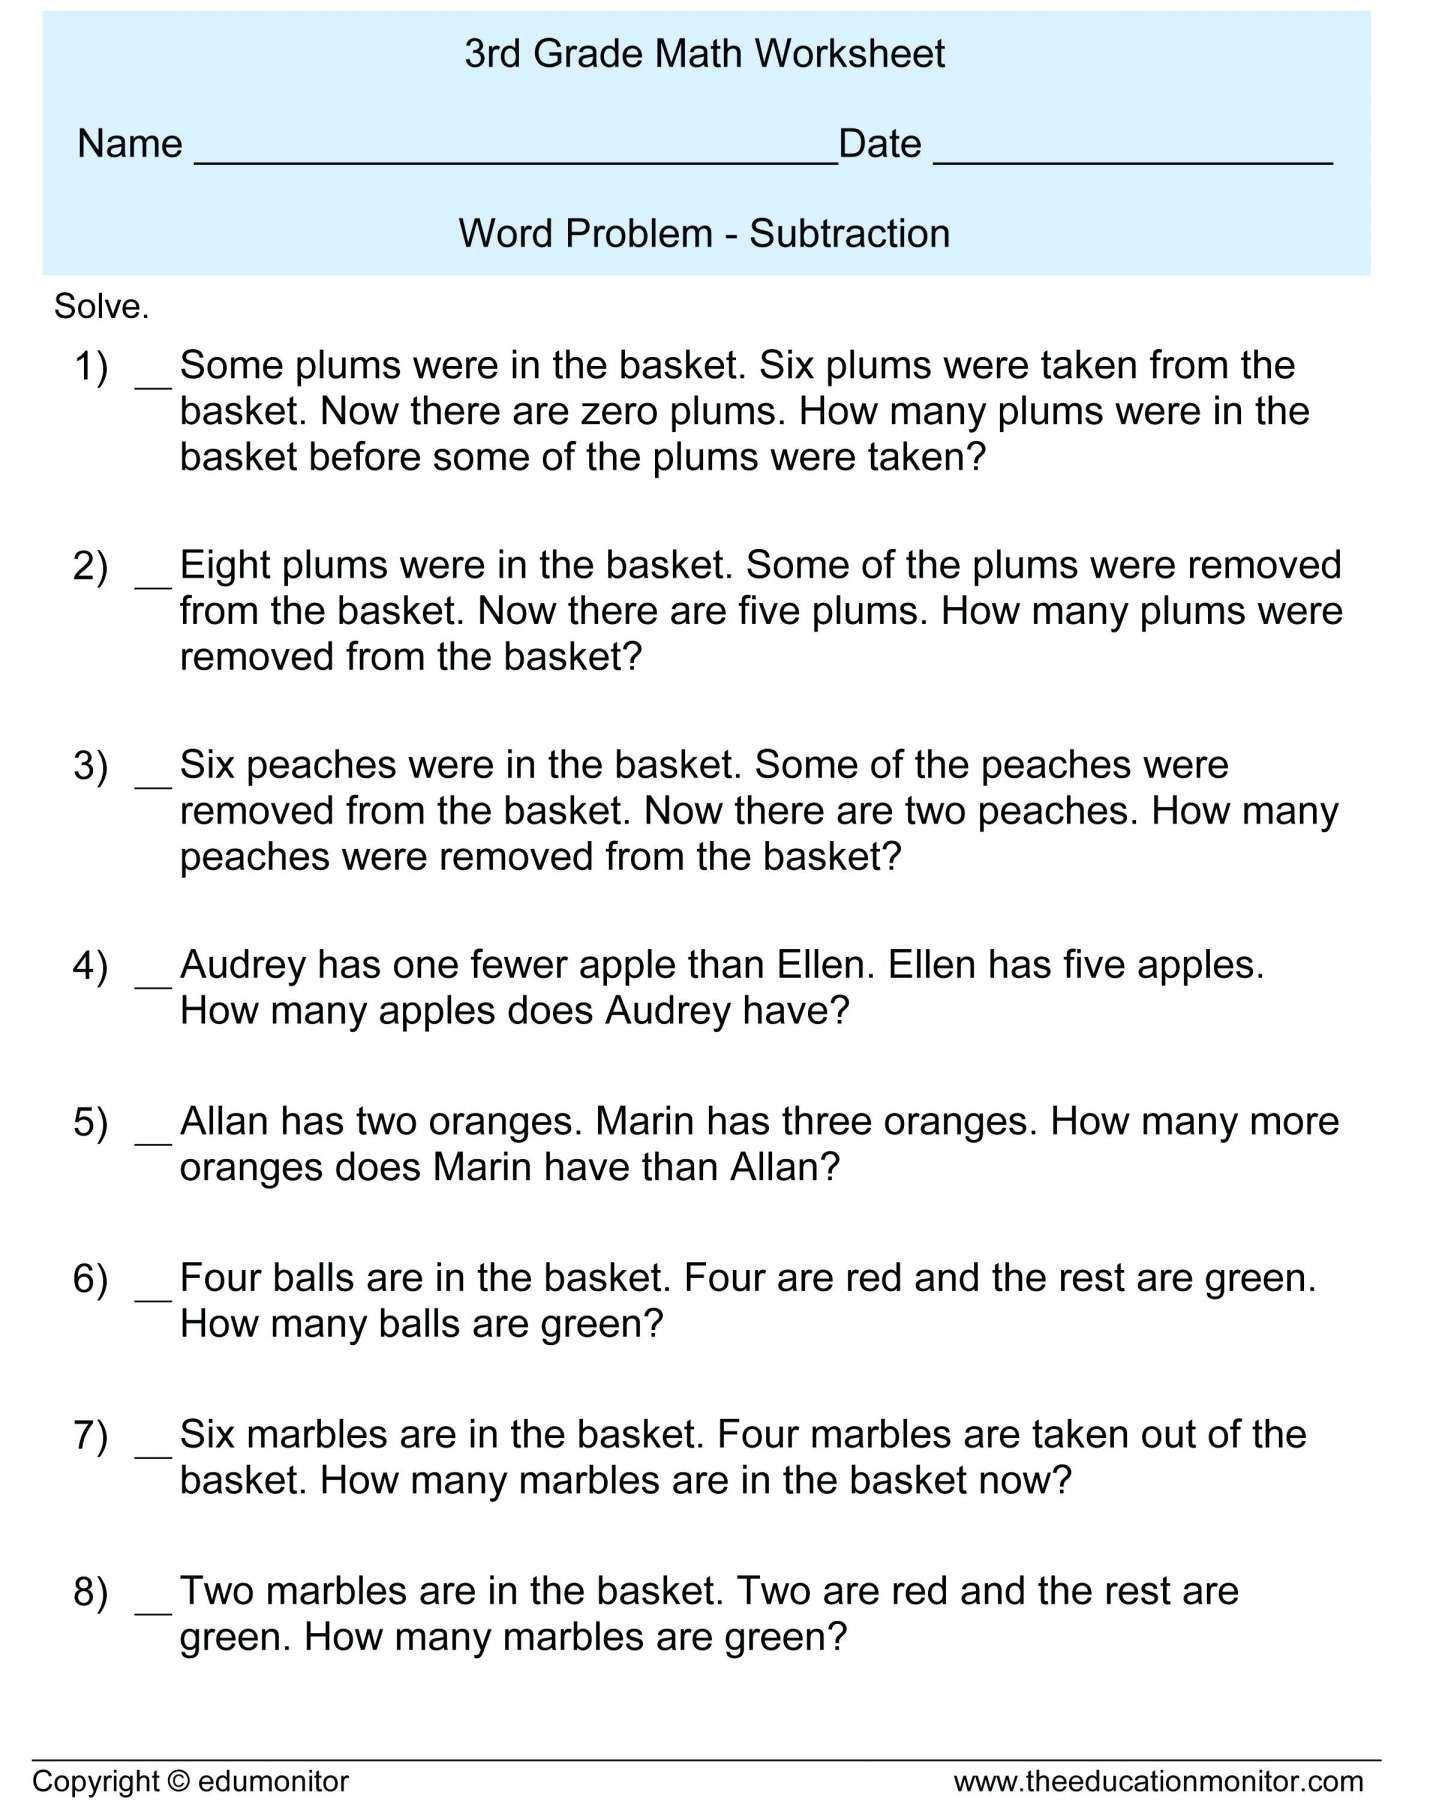 7 Astonishing Apple Math Worksheet 8th Grade